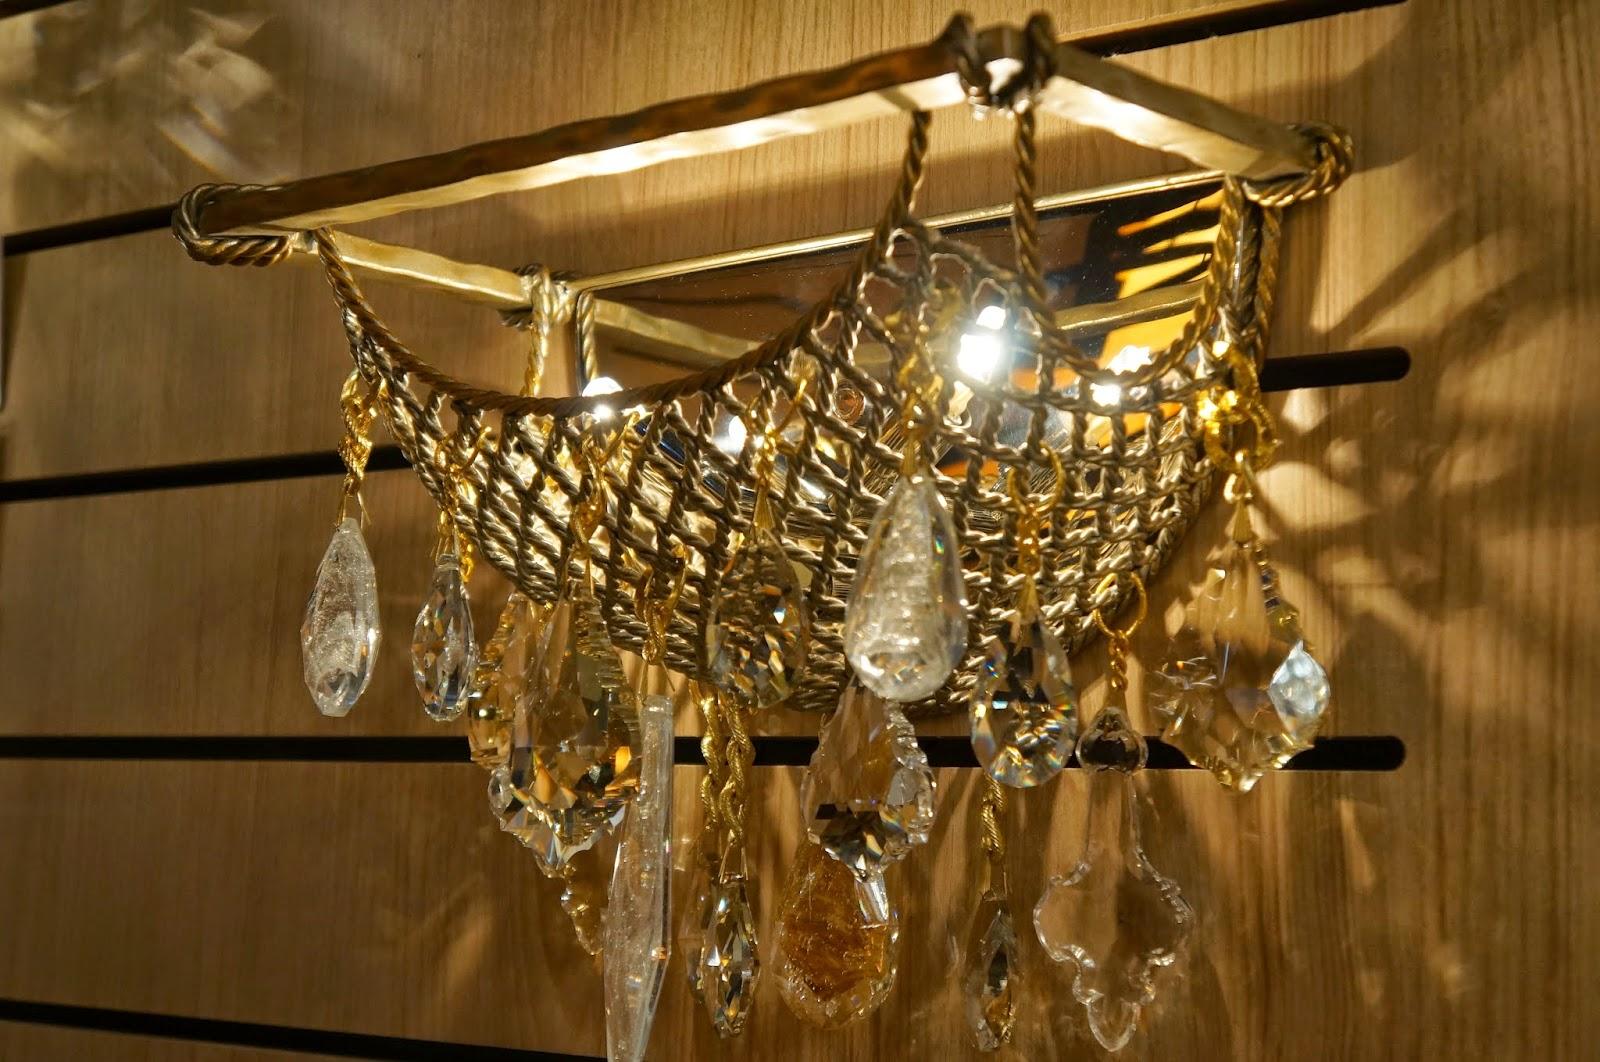 arandela Barcelona de ferro forjado à mão - Corbett Lighting - Expolux 2014